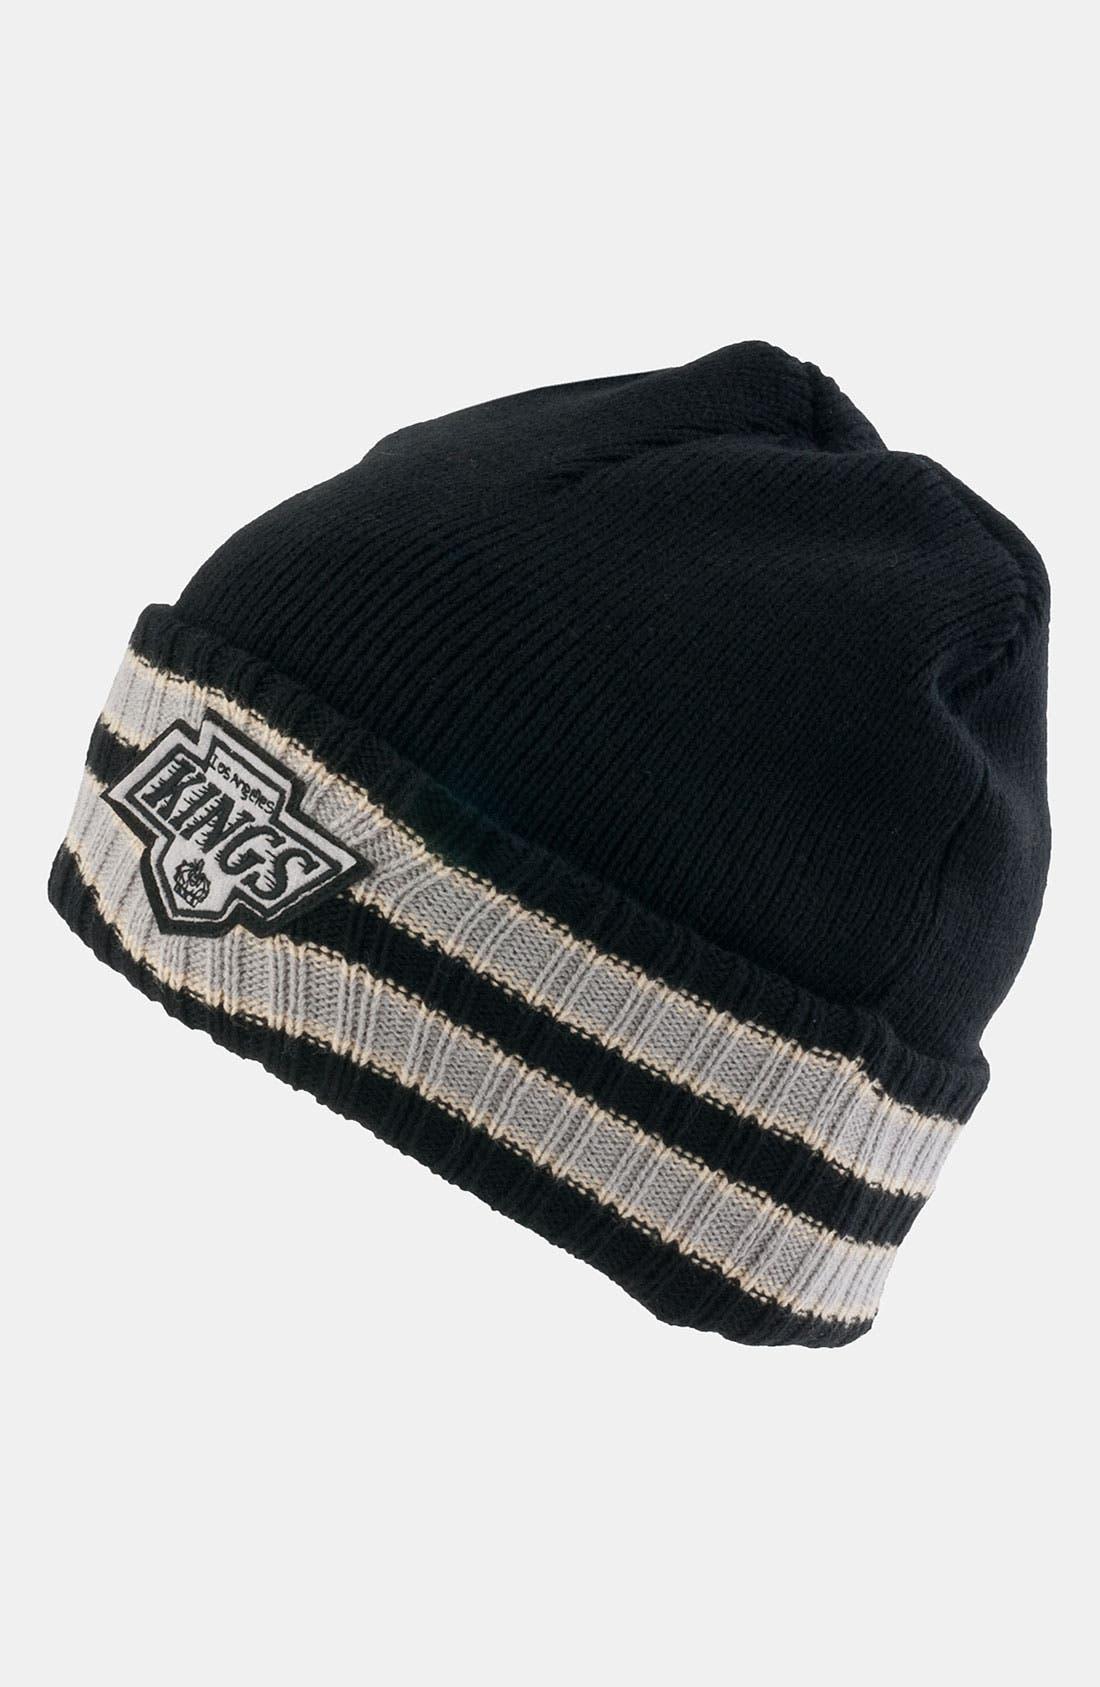 Alternate Image 1 Selected - American Needle 'Los Angeles Kings - Slash' Knit Hat